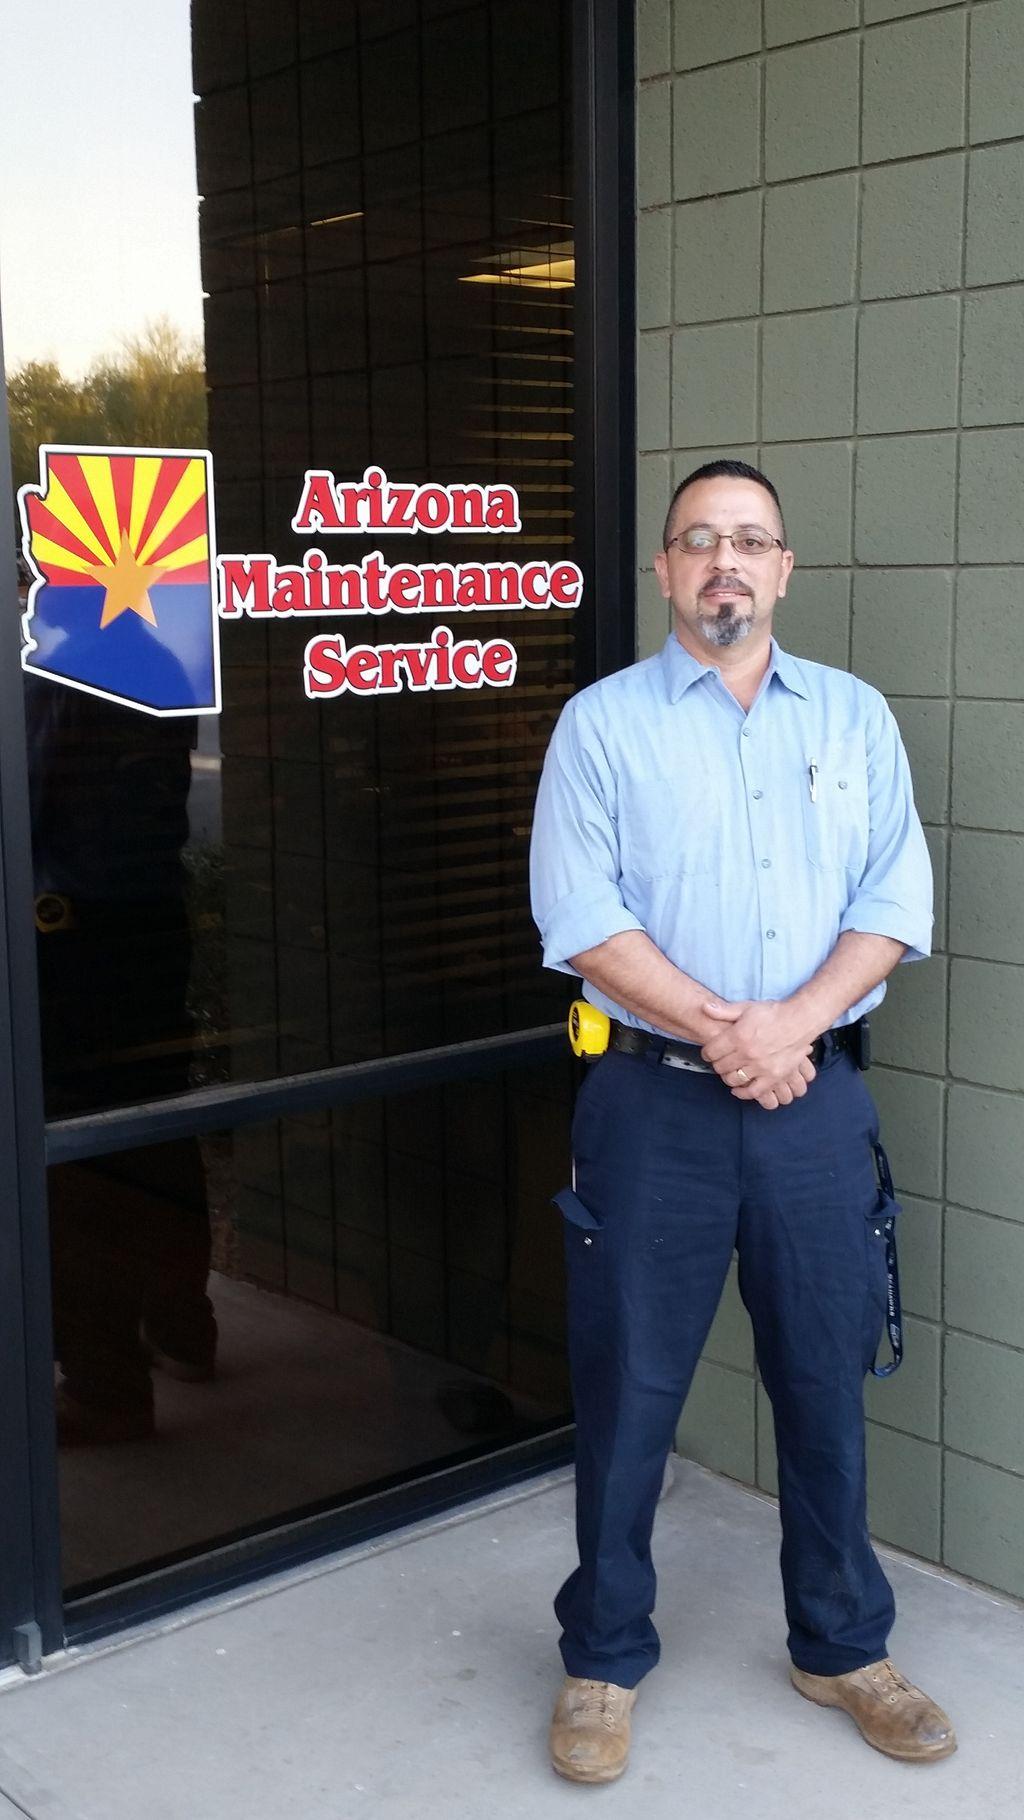 Arizona Maintenance Service